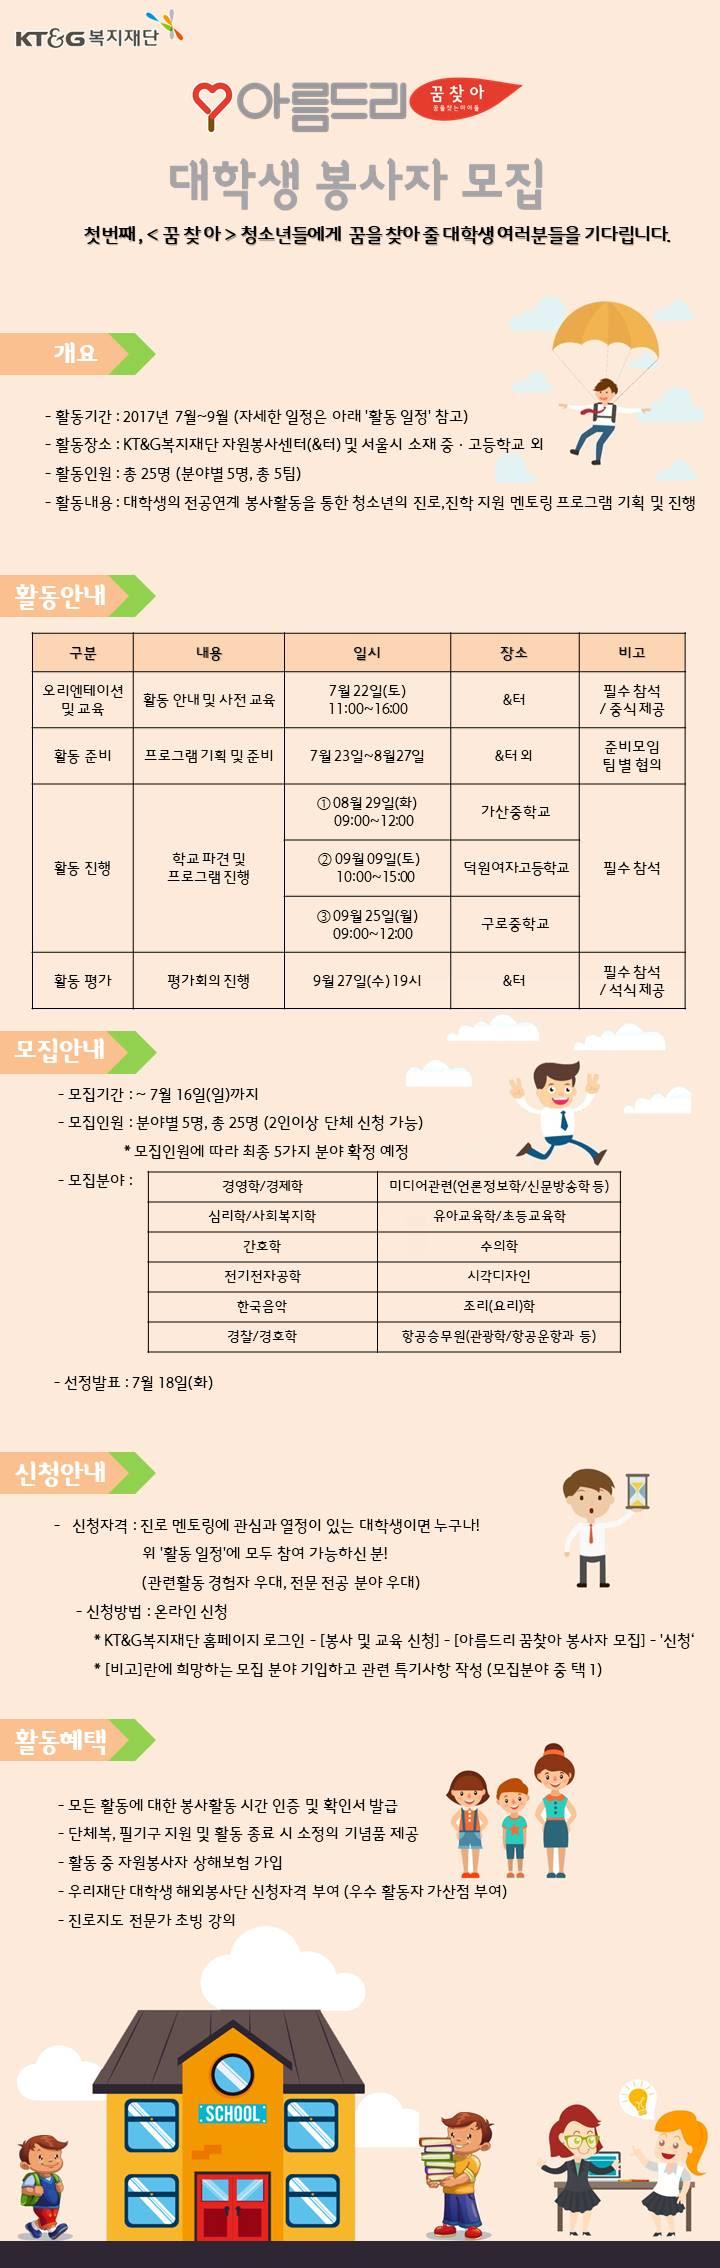 [KT&G복지재단] 청소년 진로 멘토링 <아름드리 꿈찾아> 모집